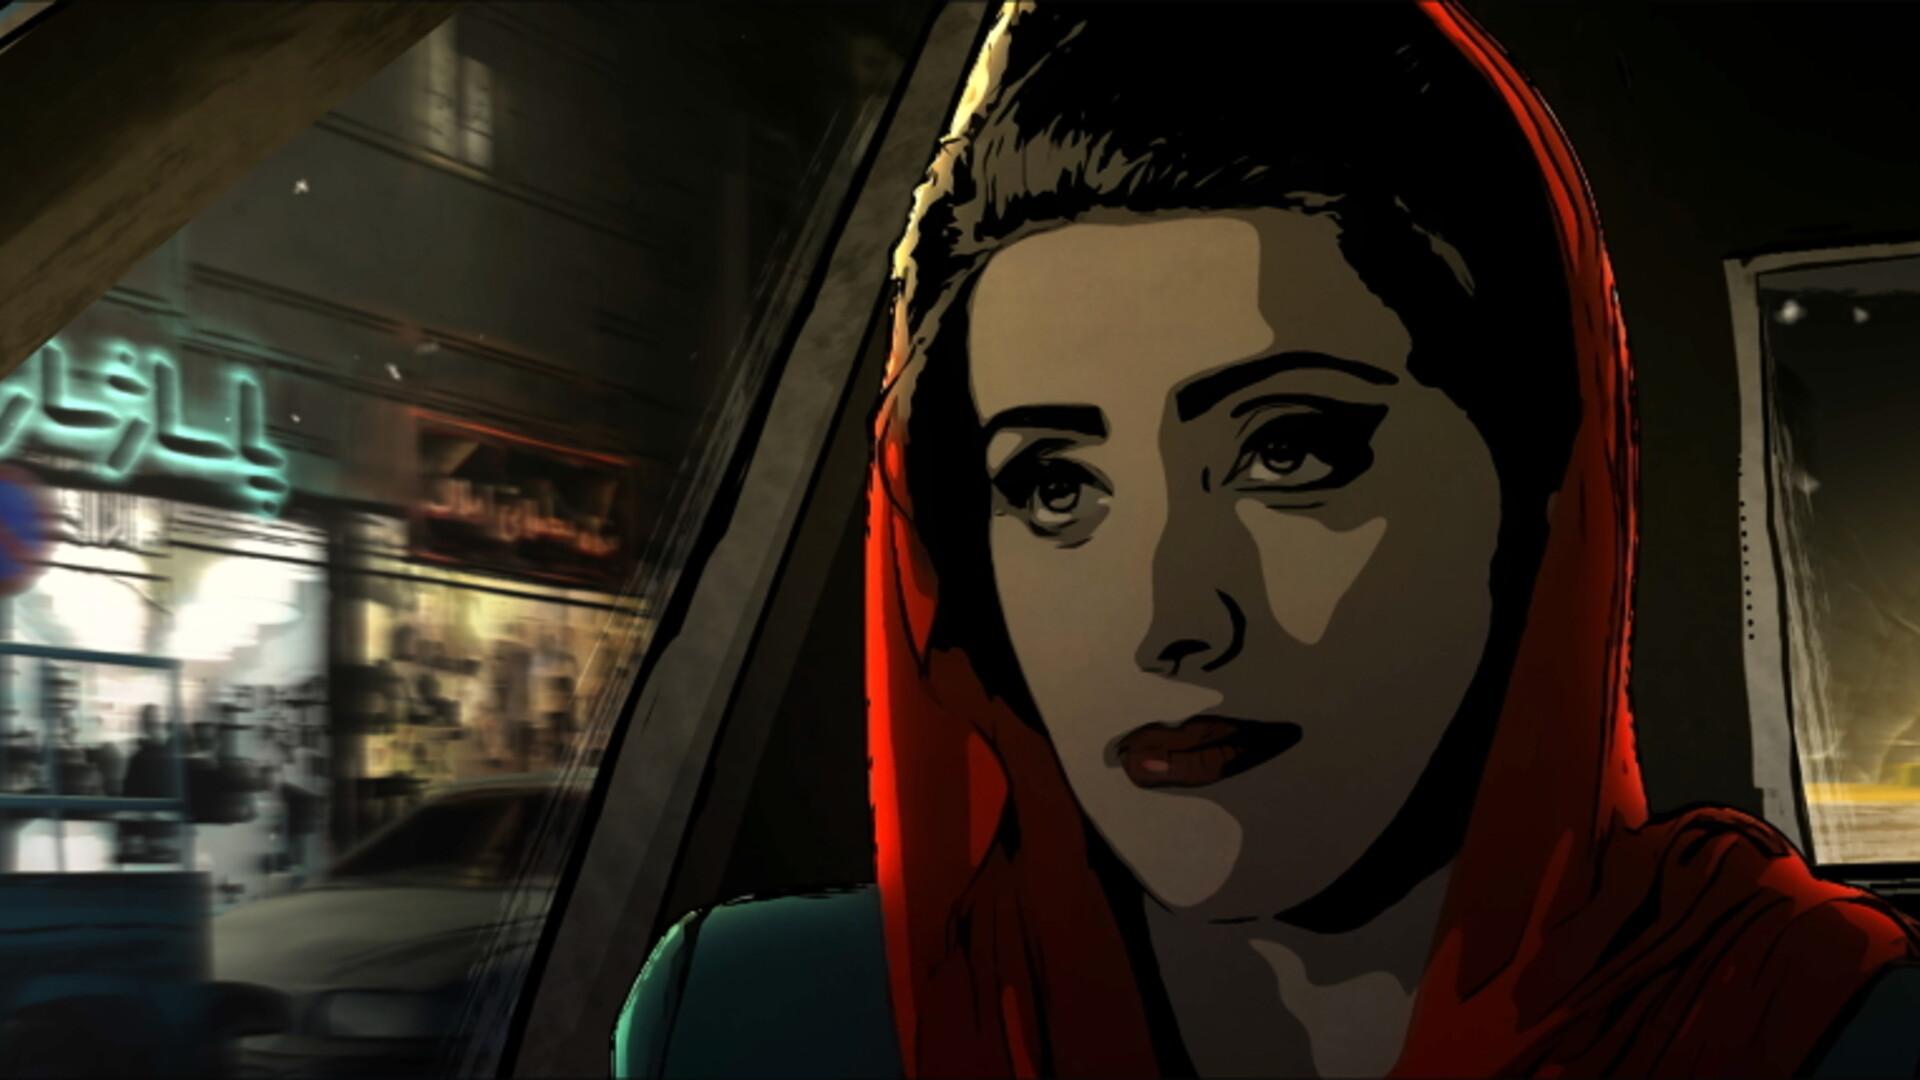 Ross films explore Iranian taboos, American prison system